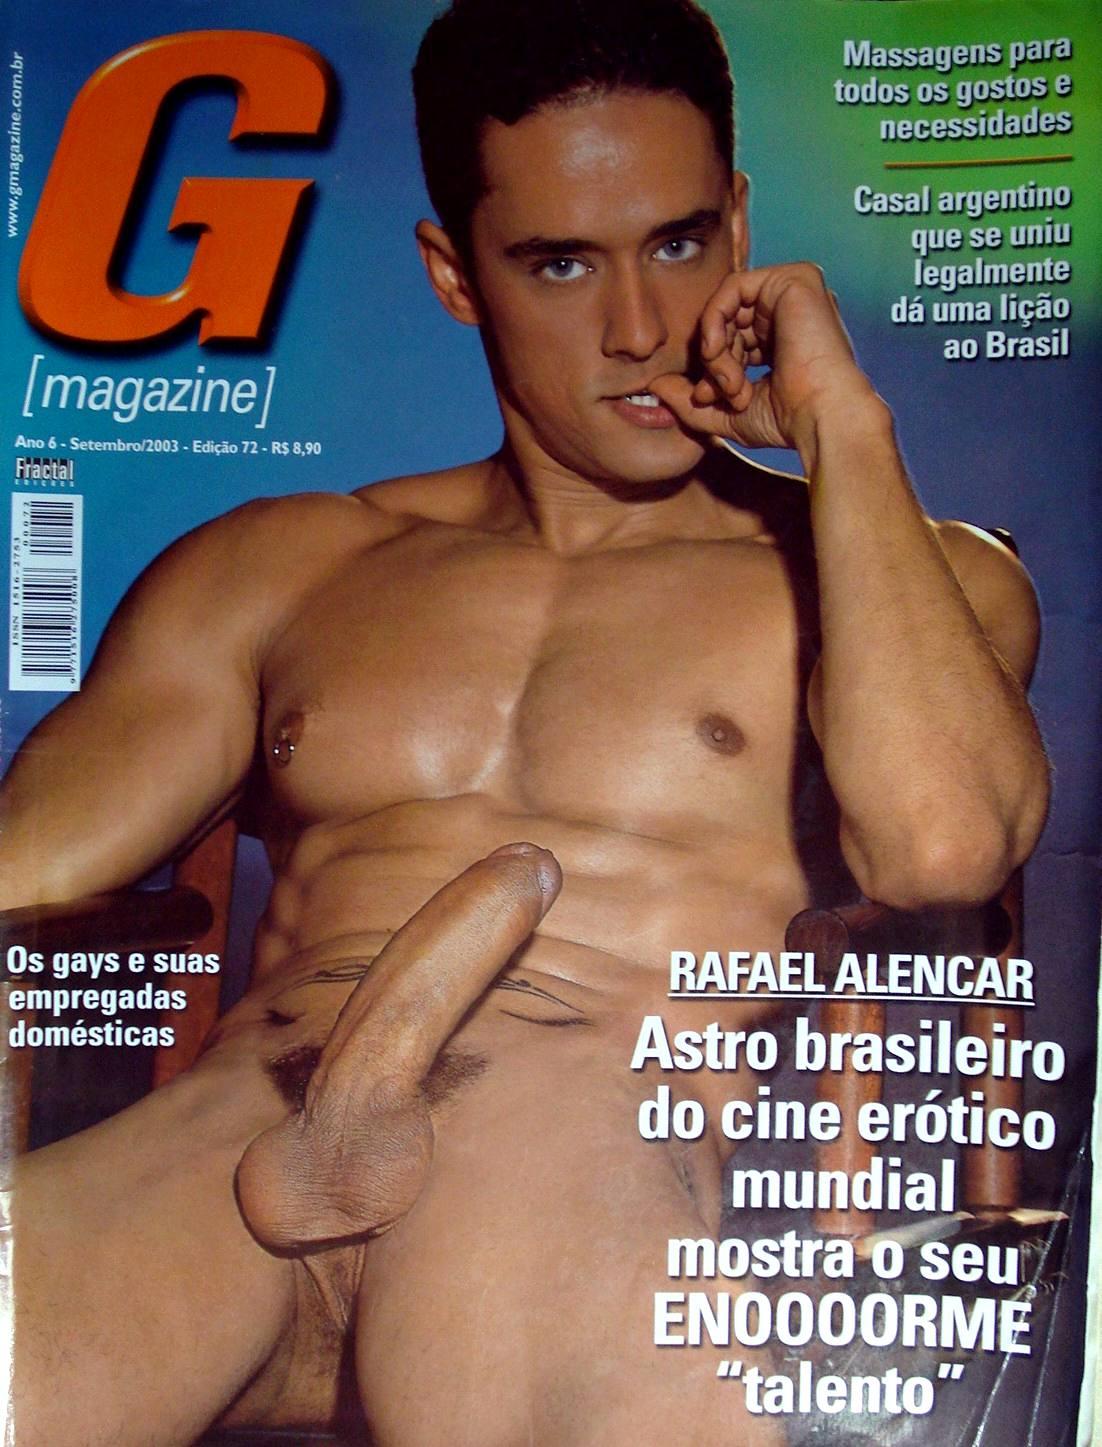 sexo no cinema prono brasil